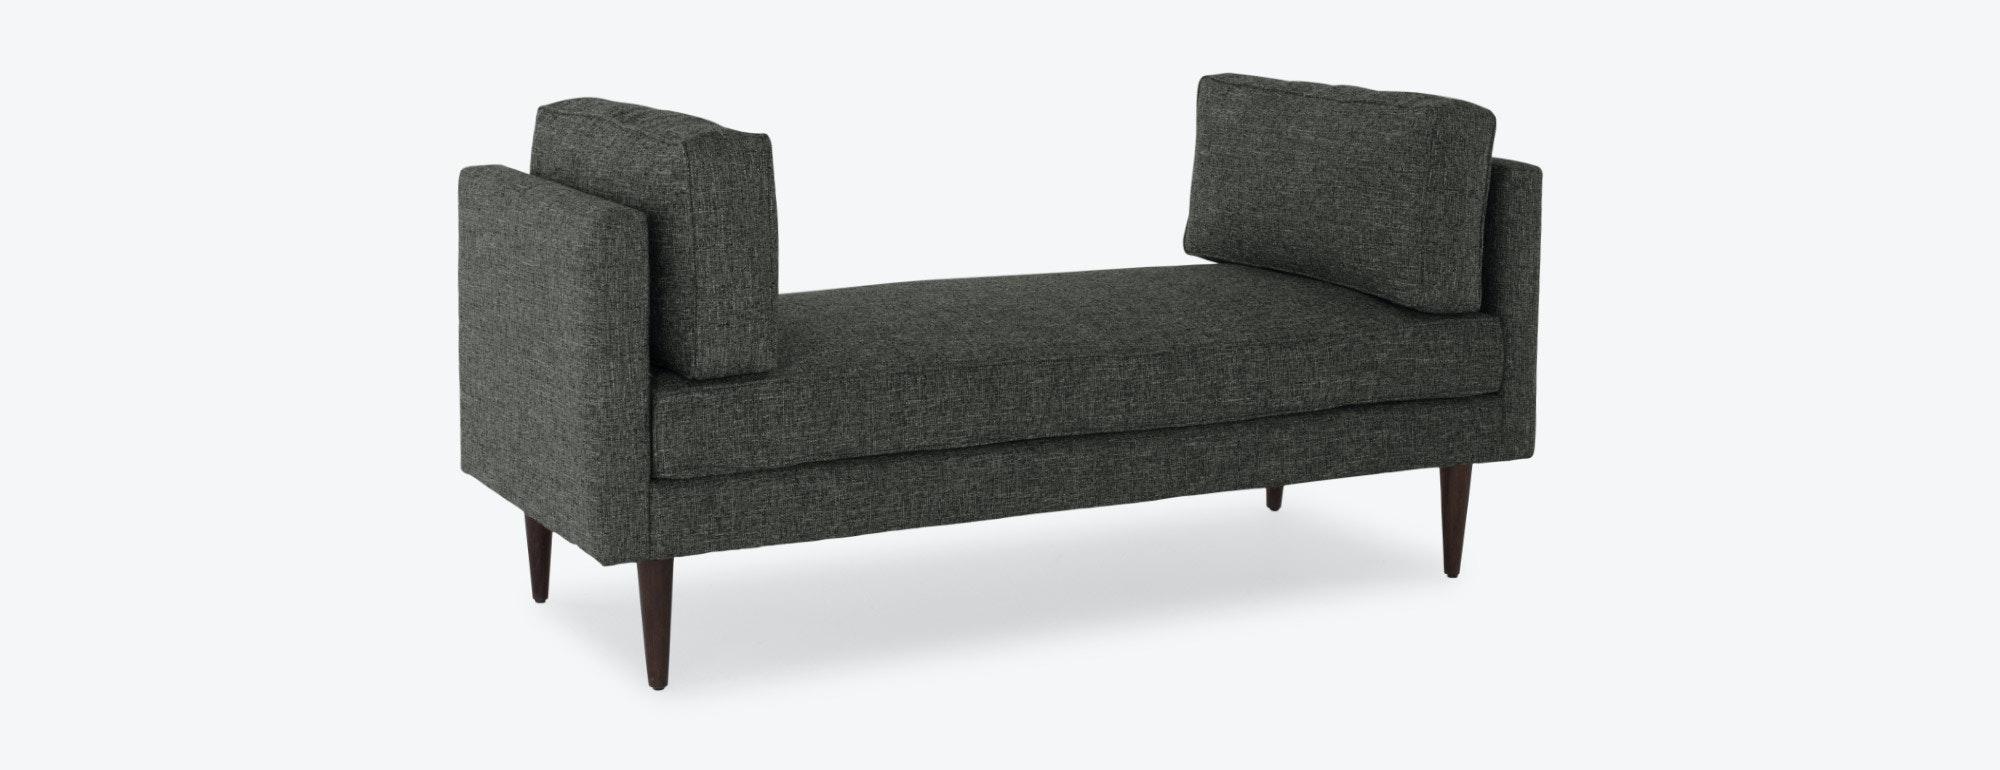 shown in Heathered Tweed Granite Fabric